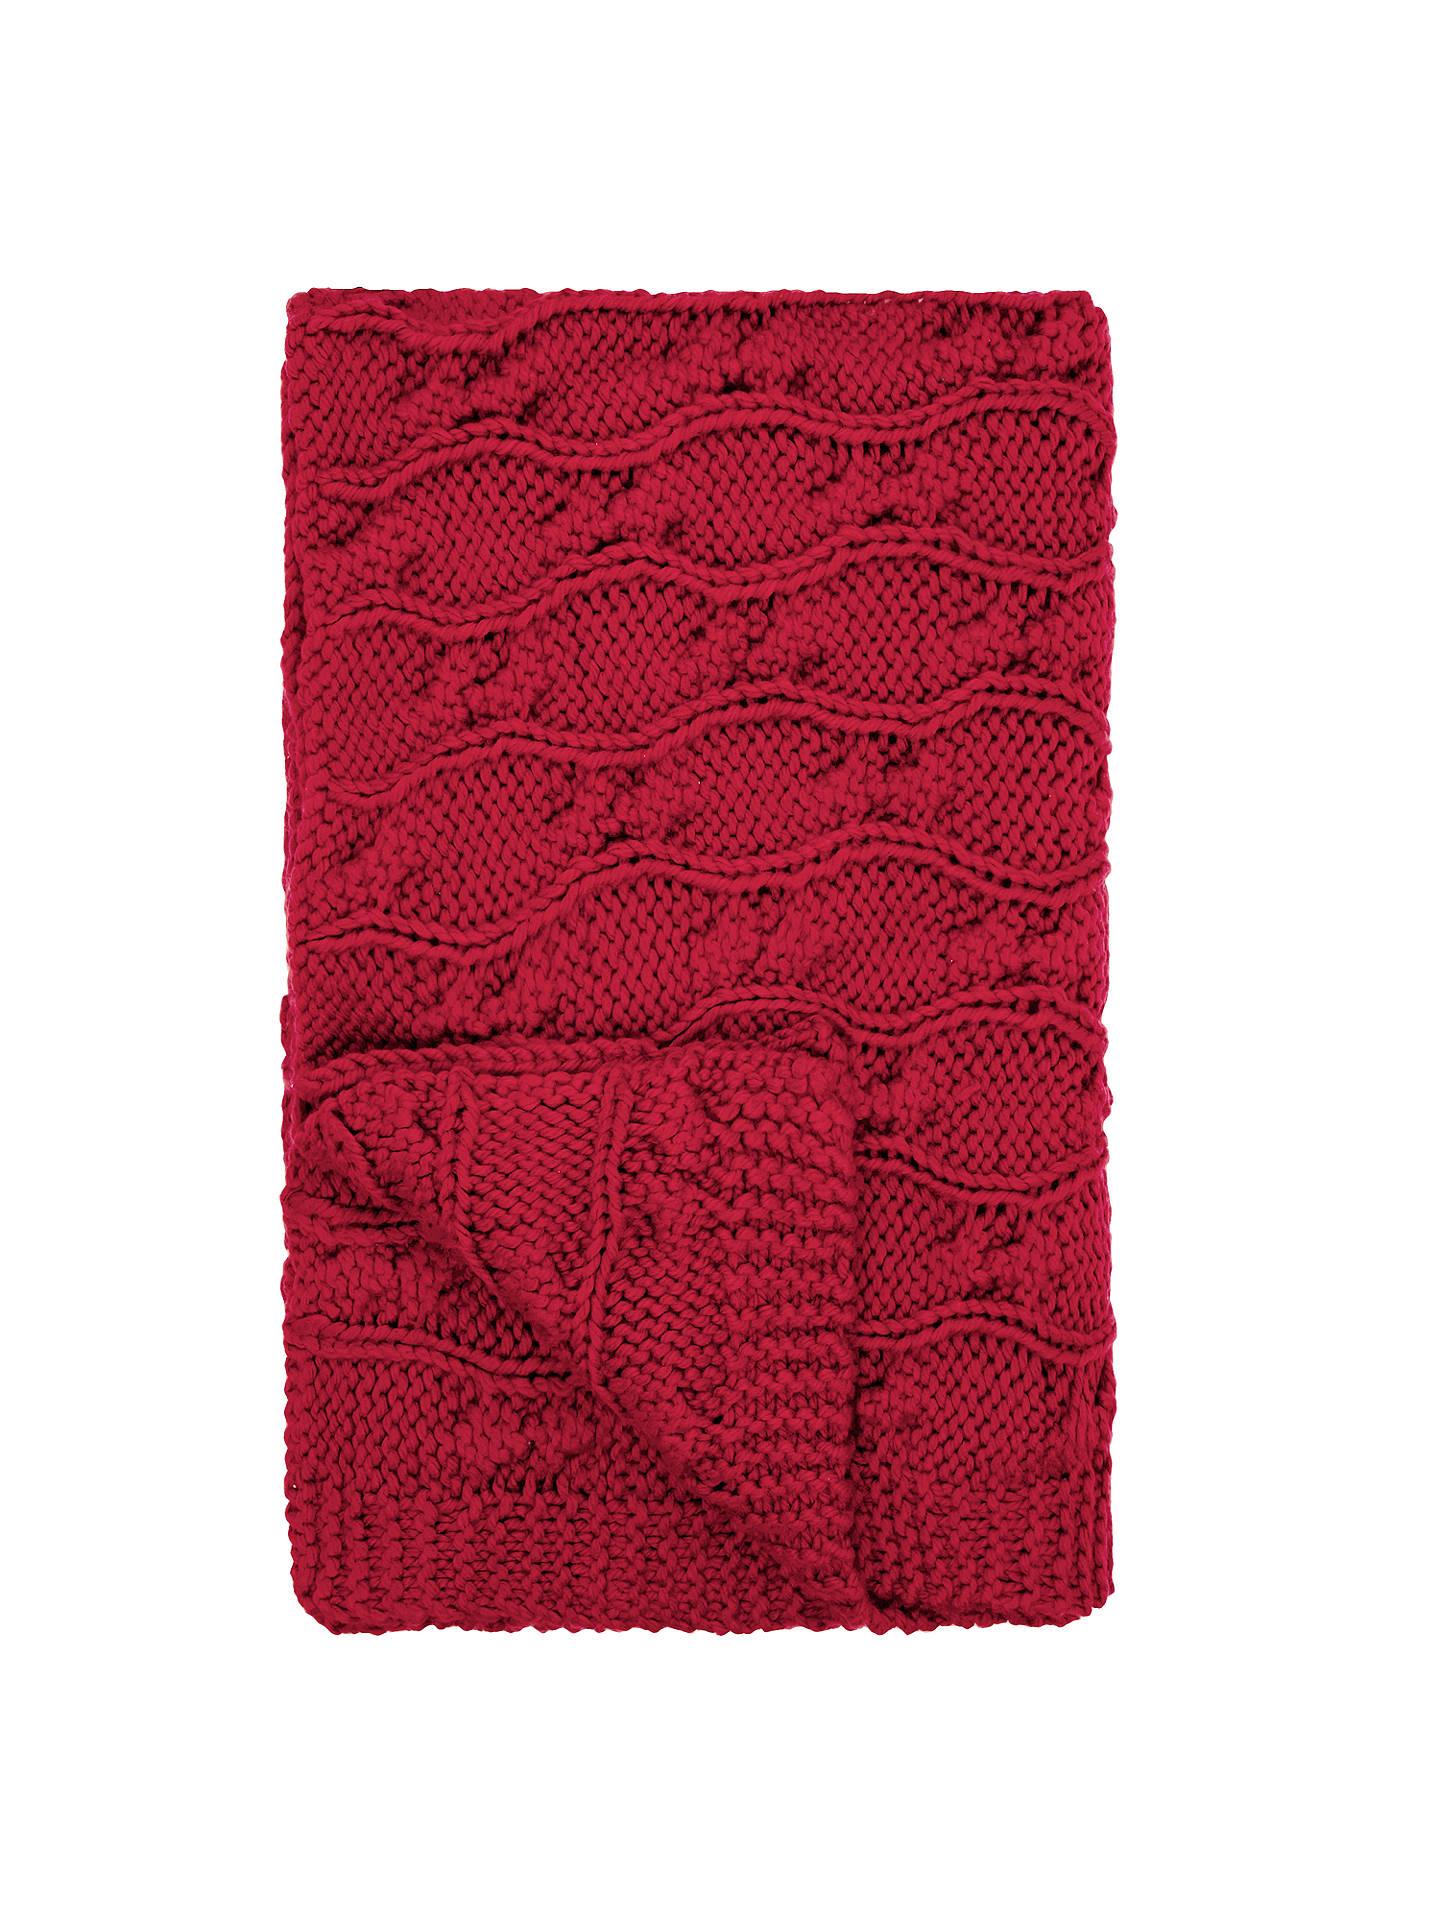 john lewis chunky knit throw at john lewis partners. Black Bedroom Furniture Sets. Home Design Ideas